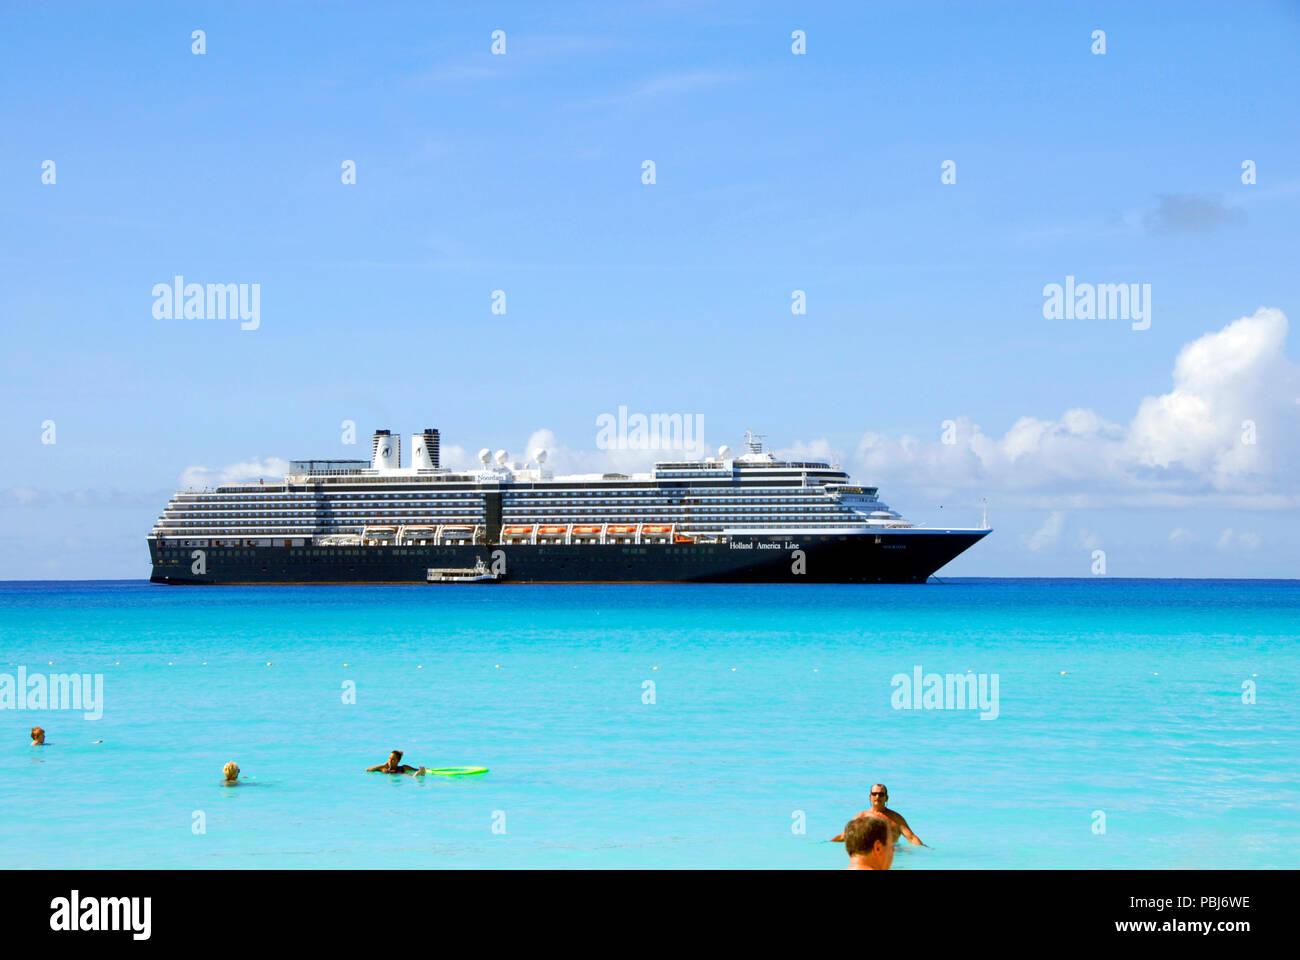 Cruise liner ms Noordam anchored off Half Moon Cay, Bahamas - Stock Image